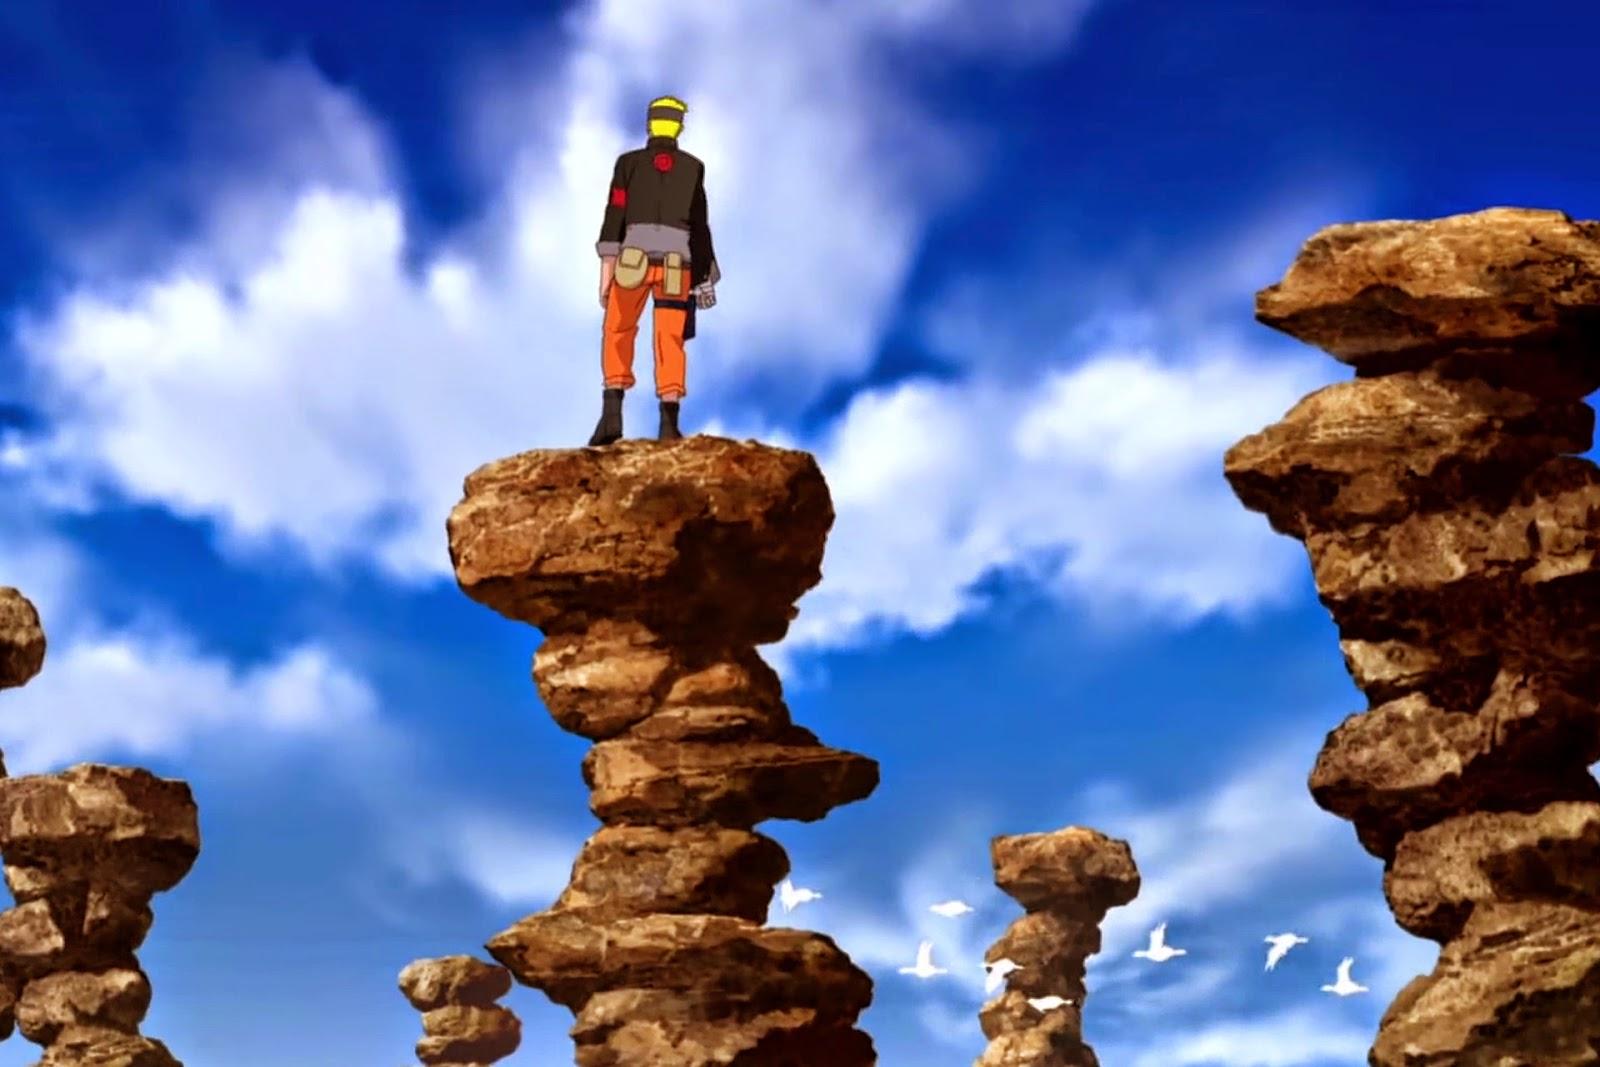 Mengulas Semua Tentang Naruto The Last Movie - UShare Blog